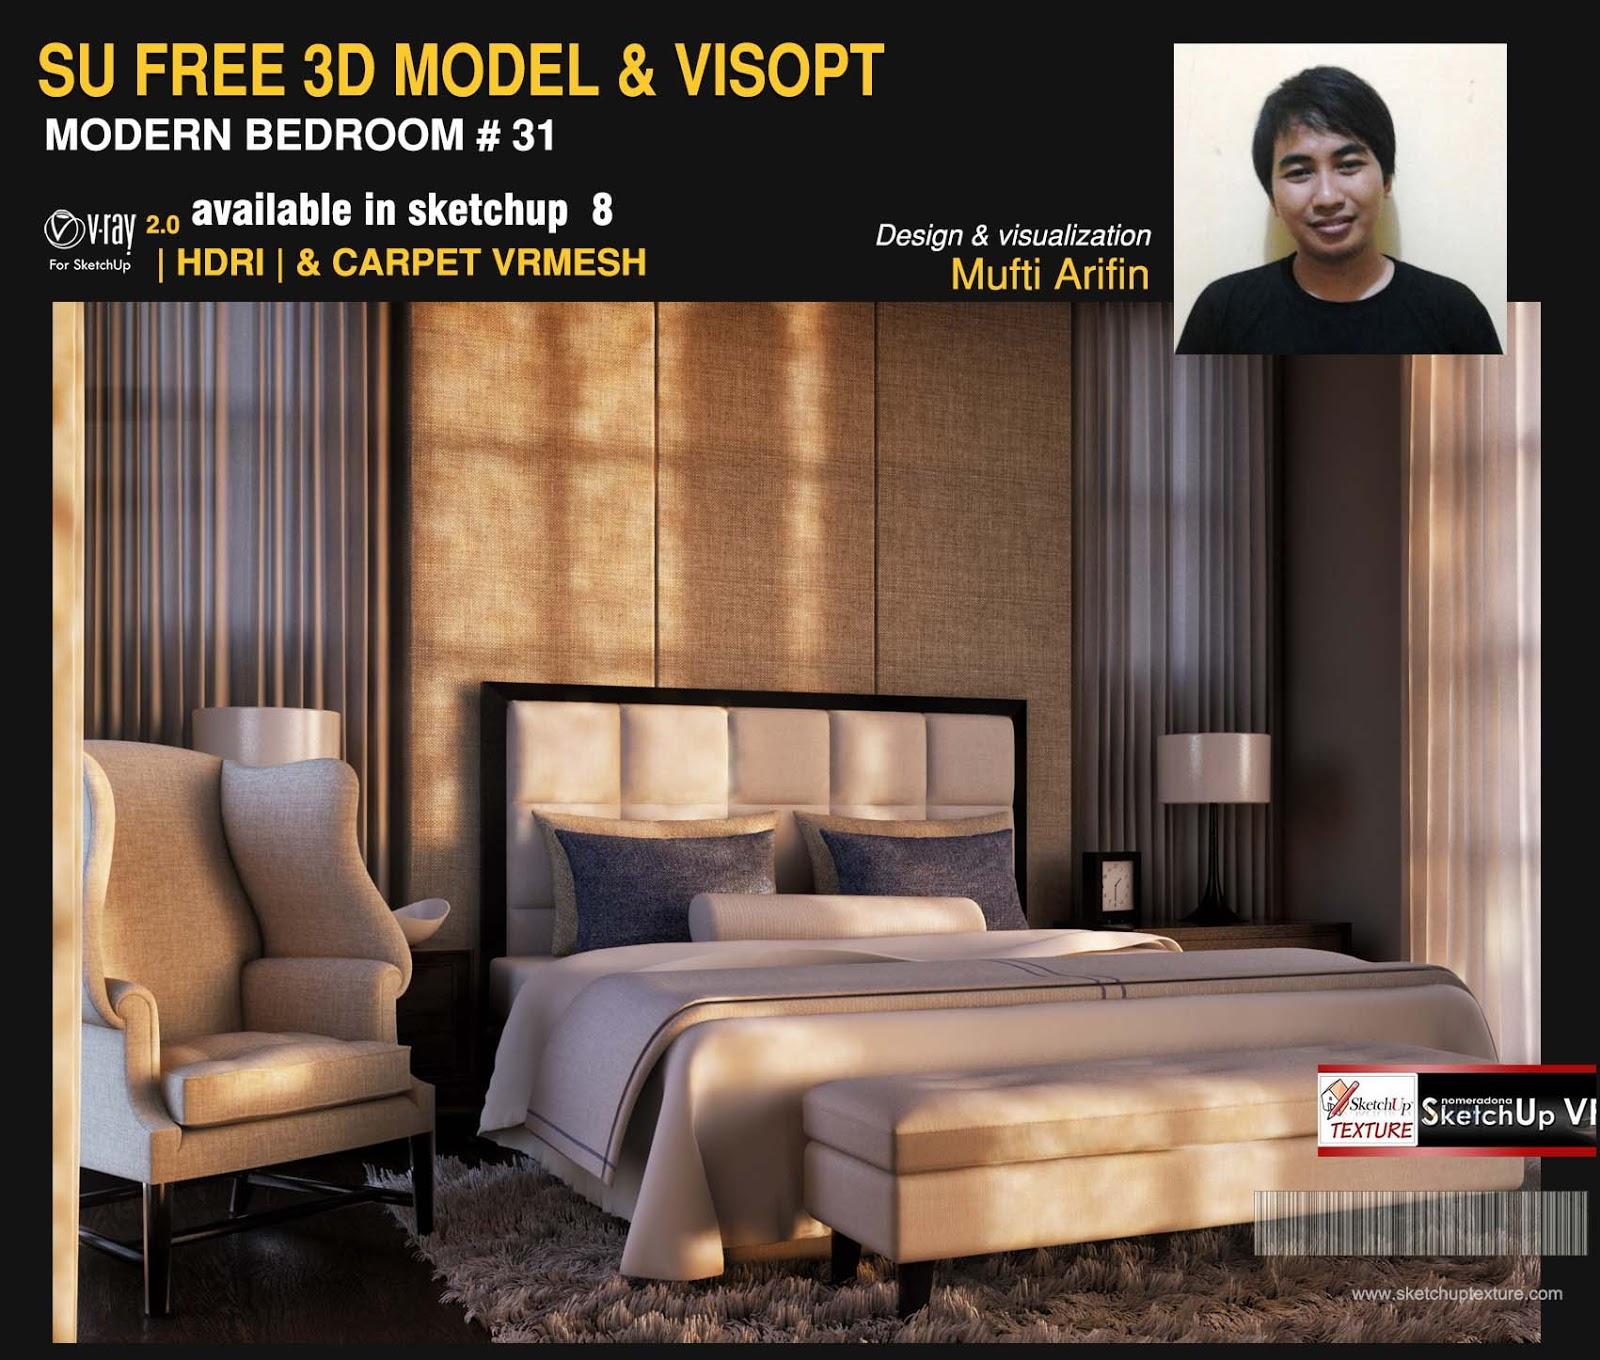 SKETCHUP TEXTURE: free sketchup model modern bedroom #31 & Vray Visopt